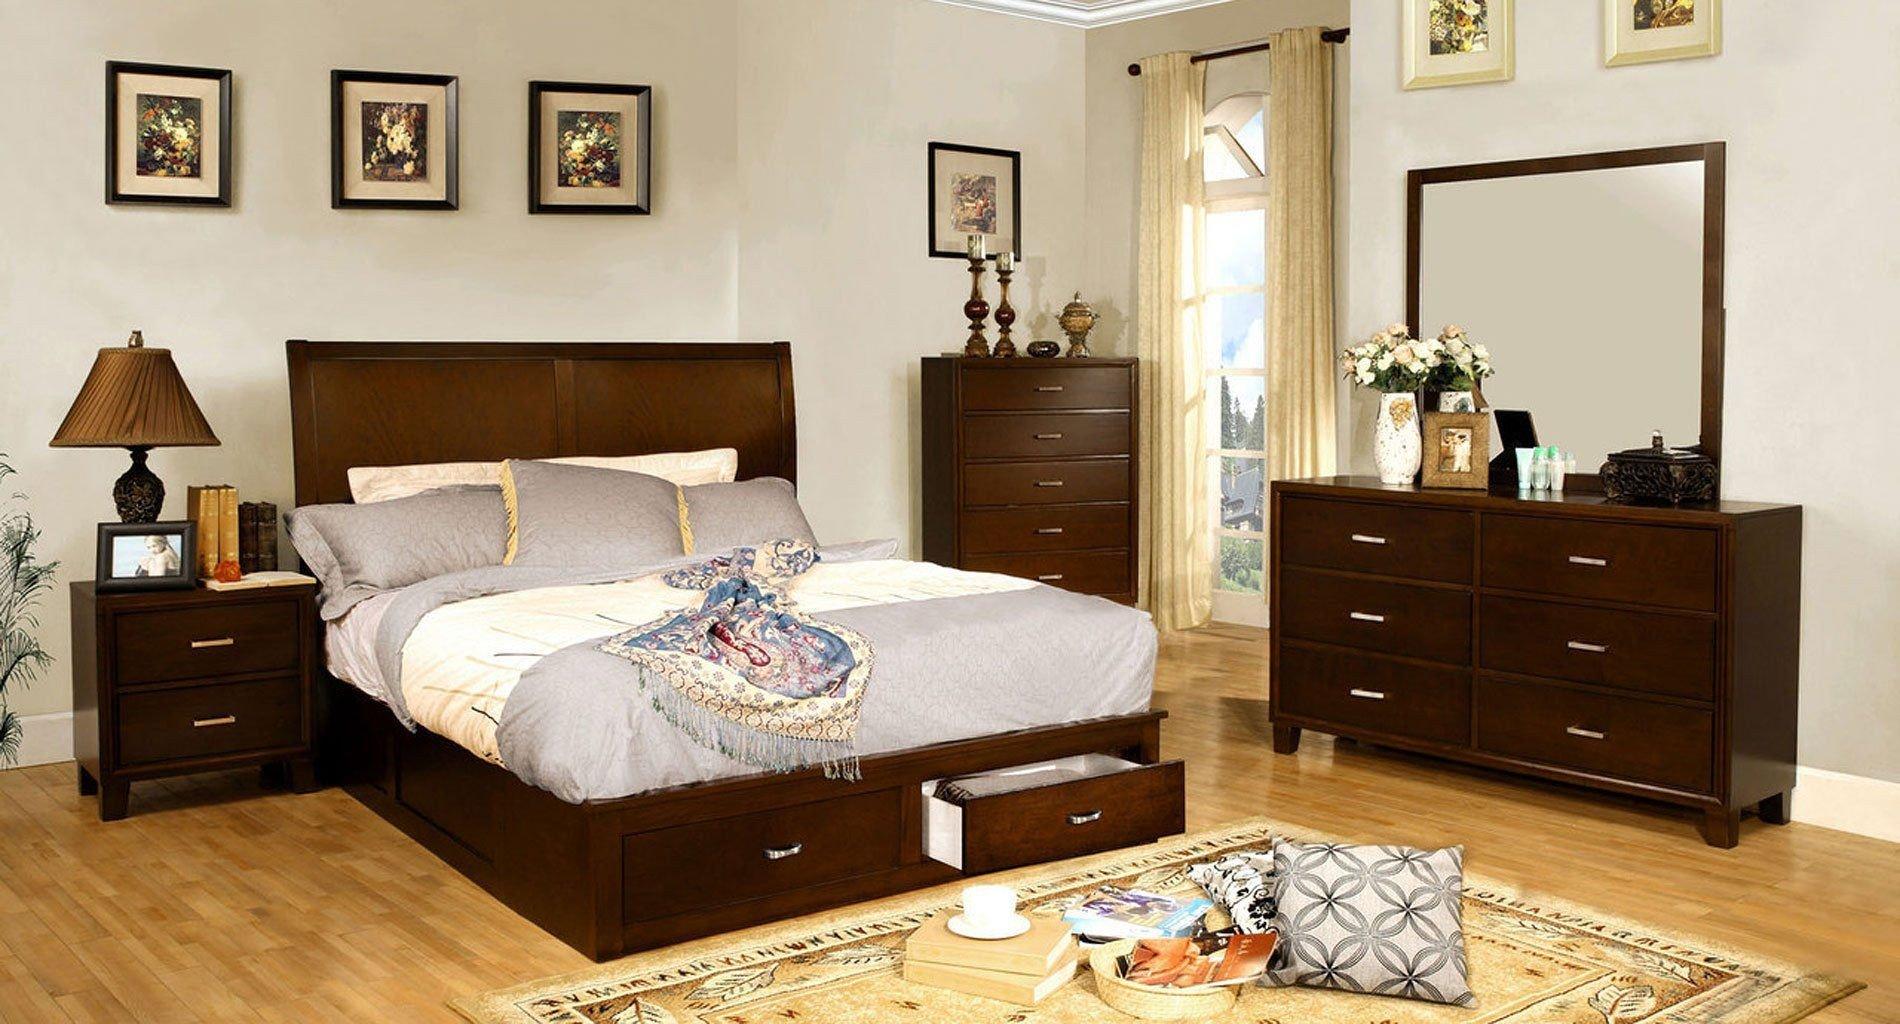 Solid Cherry Wood Bedroom Furniture Beautiful Enrico Storage Platform Bedroom Set Brown Cherry